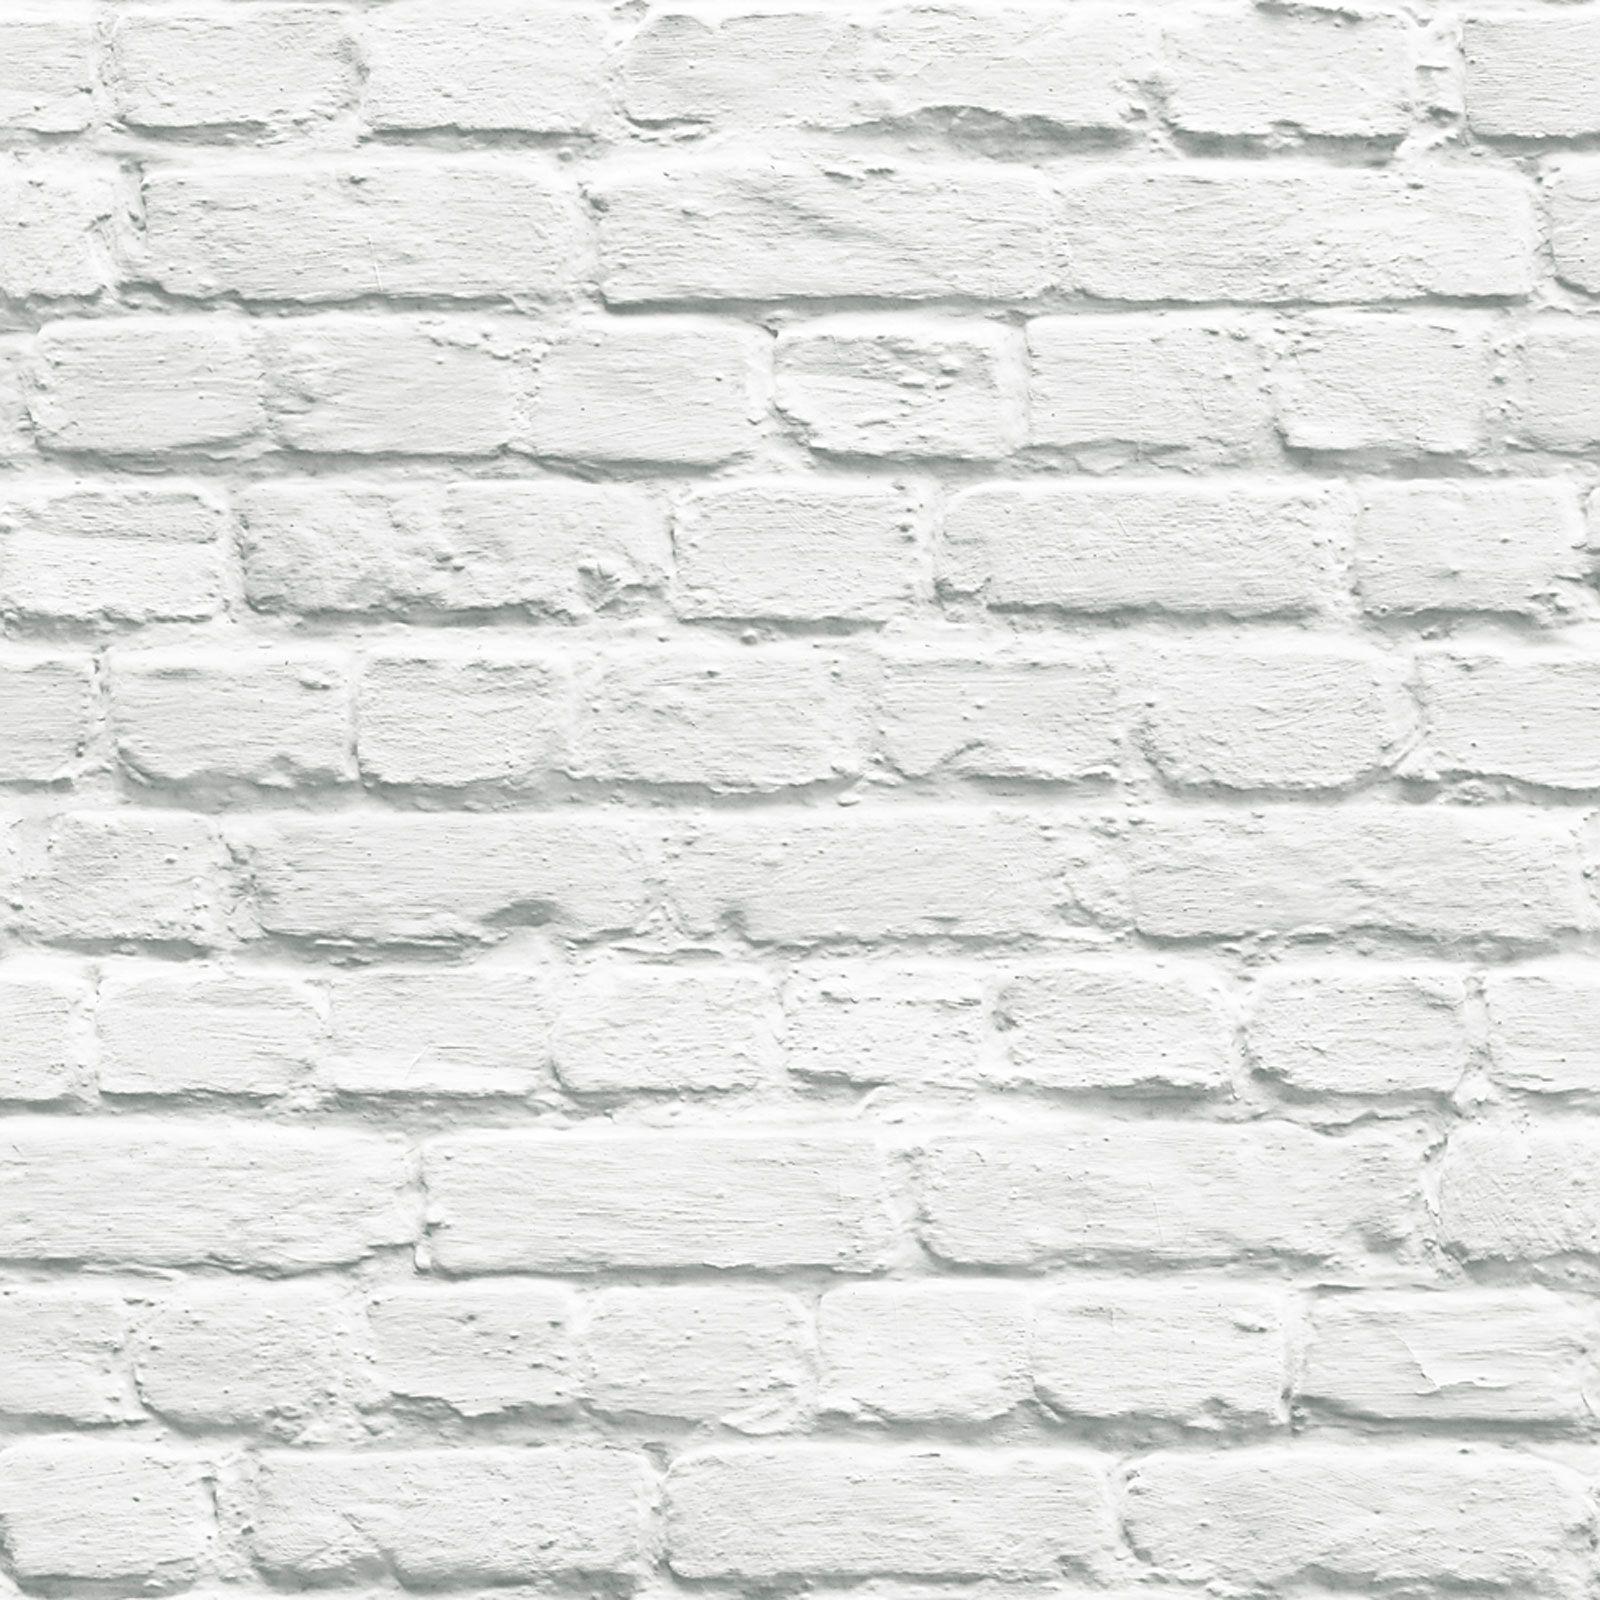 3d Effect Stone Brick Wall Textured Vinyl Wallpaper Self Adhesive Bianco Carta Da Parati Effetto Mattoni 5 Stili